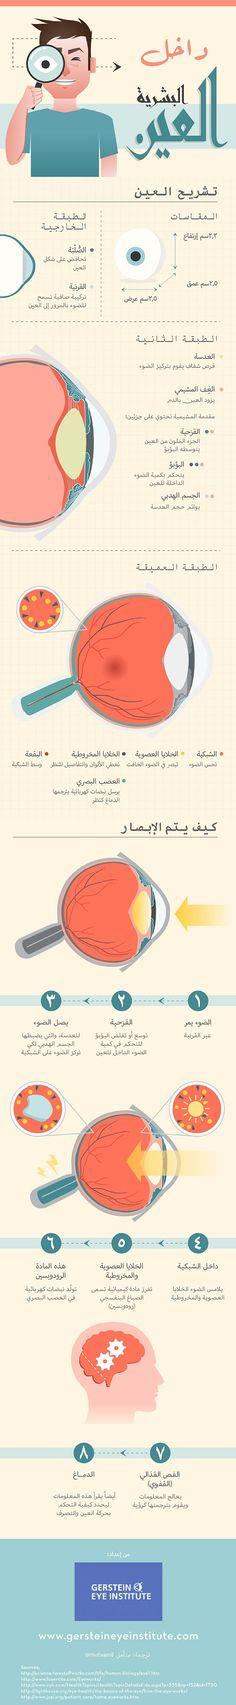 انفوجرافيك عربي - داخل العين البشرية #انفوجرافيك #عربي #العين #infographic #arabic #Eye